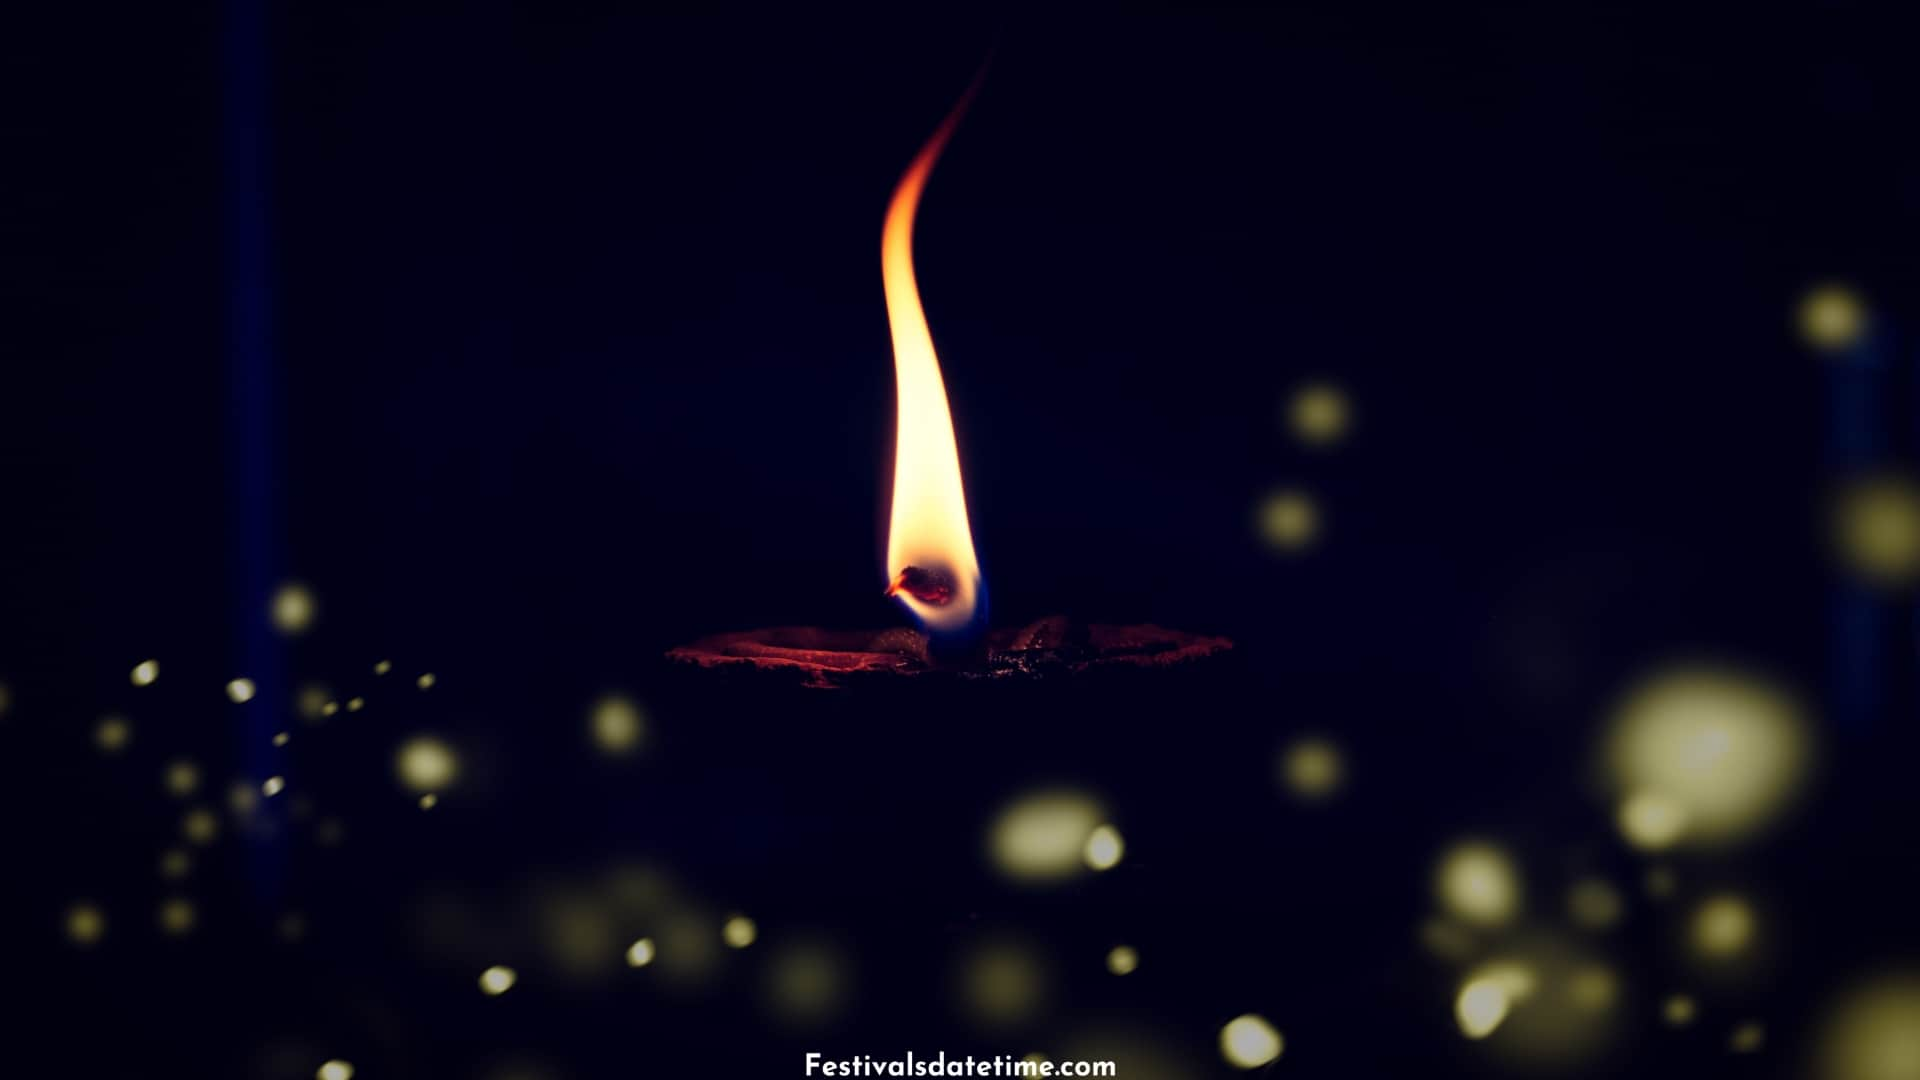 diwali_background_images_hd_download